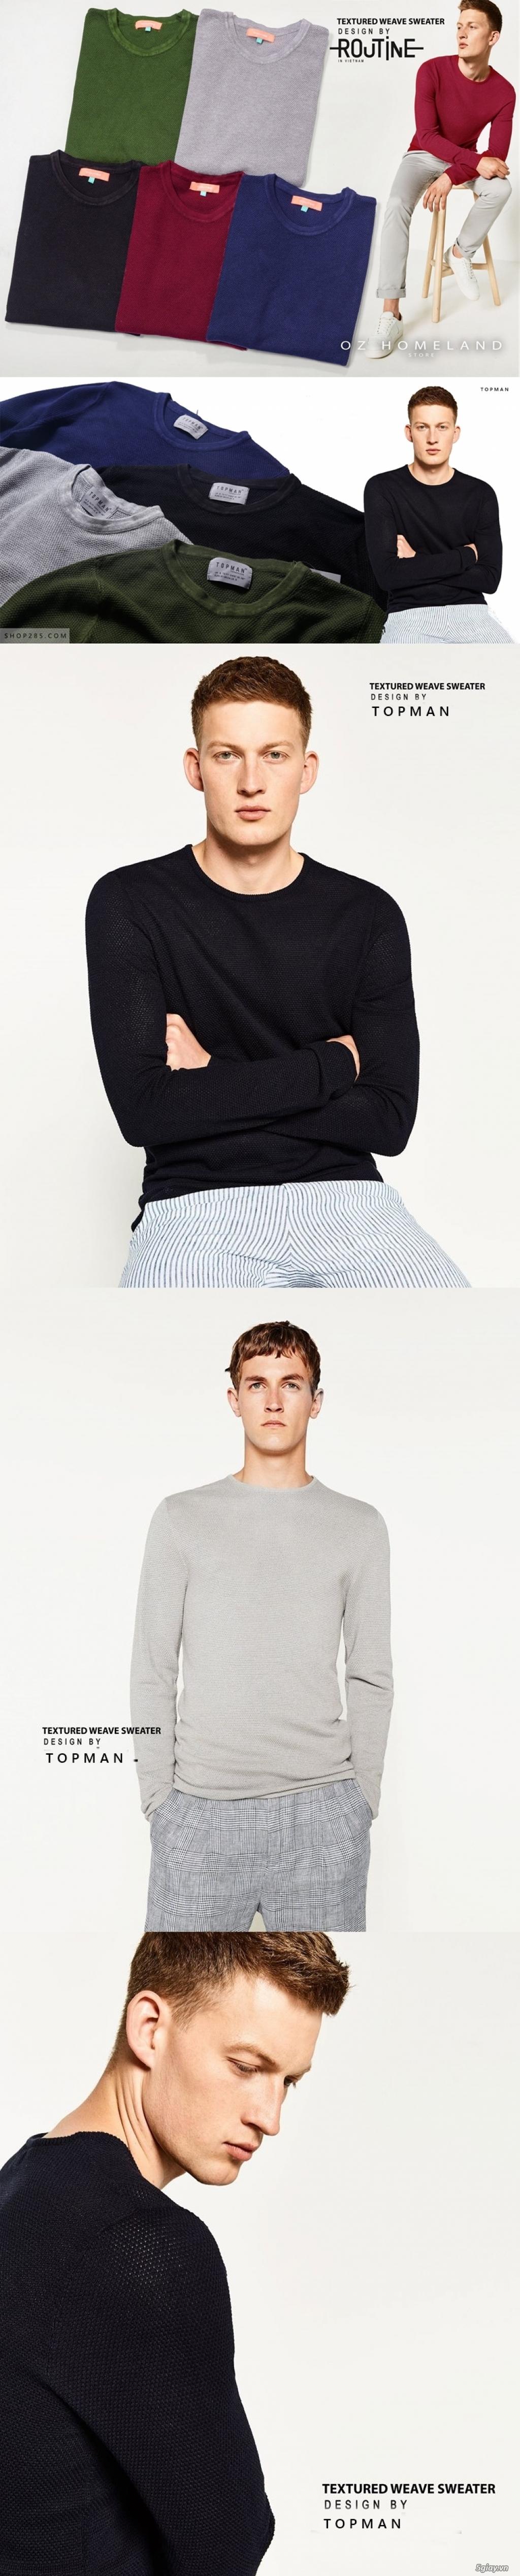 Shop285.com - Shop quần áo : Zara,Jules,Jake*s,,Hollister,Aber,CK,Tommy,Levis - 20